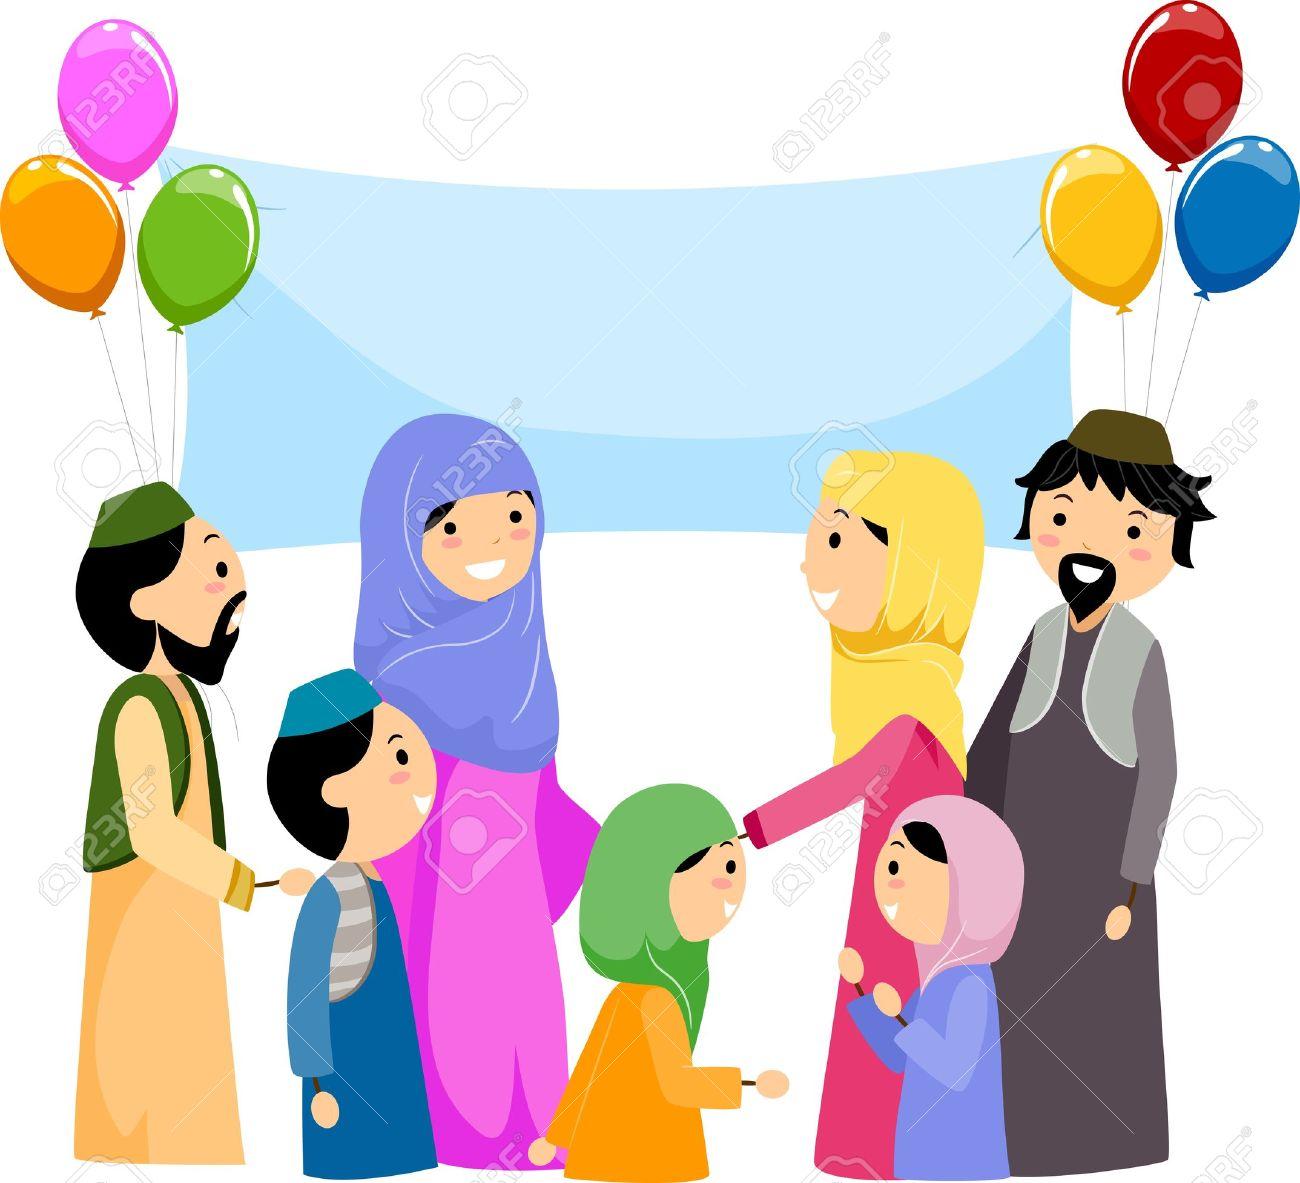 Good Eid Special Eid Al-Fitr Feast - 9707247-illustration-of-muslims-celebrating-eid-al-fitr  HD_446331 .jpg